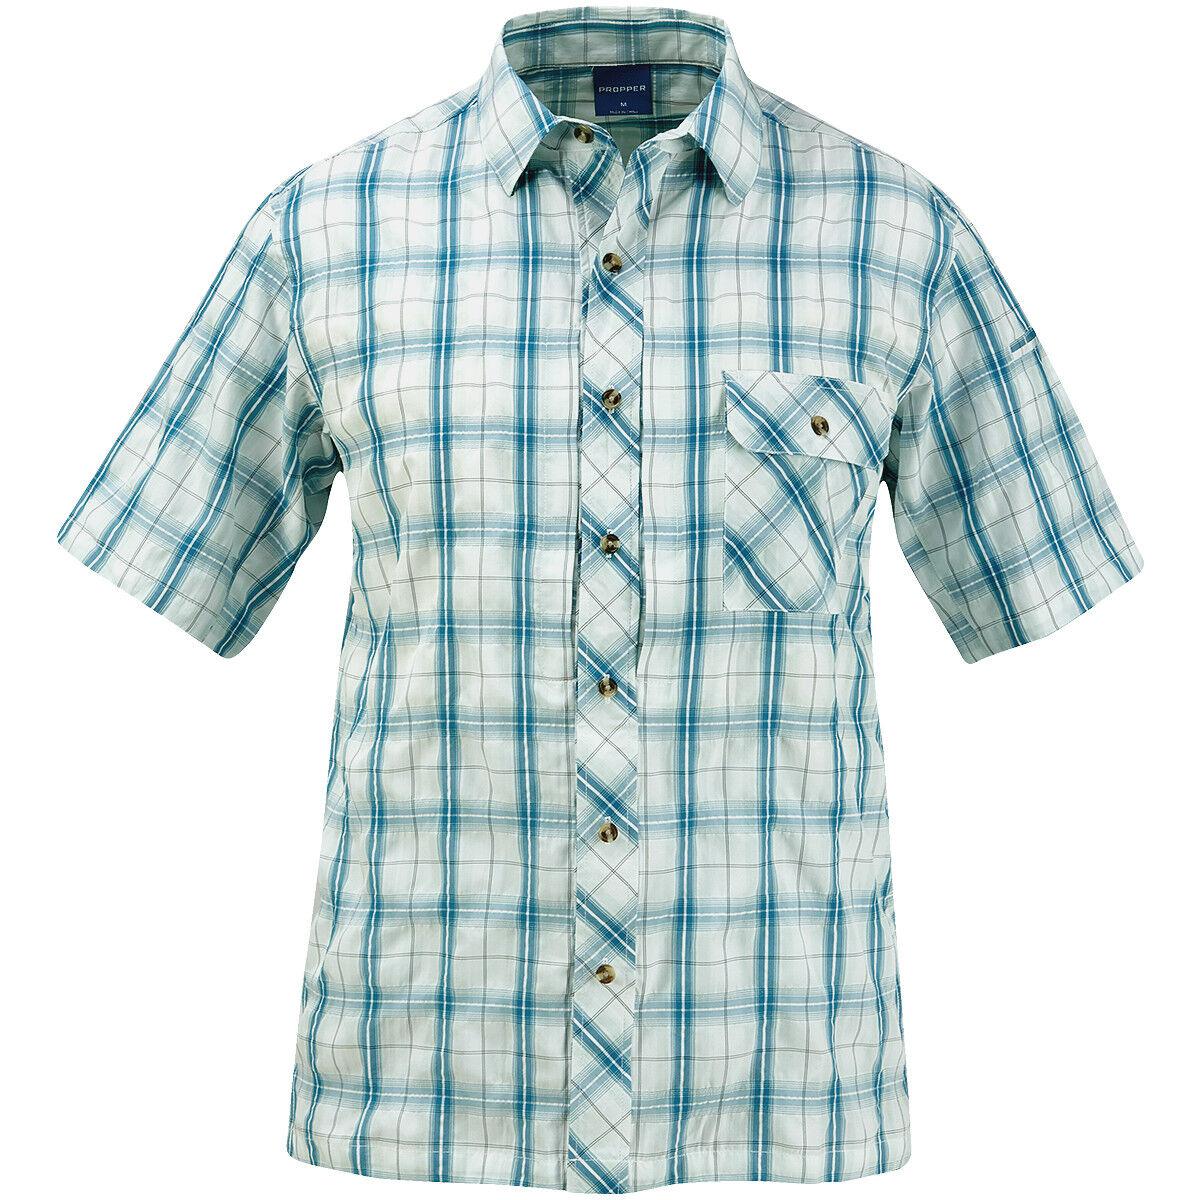 Propper Propper Propper CoGrün Button-Up Kurzarm Hemd Sicherheit Herren Patrouille Mallard Plaid | Billig ideal  d8ca16